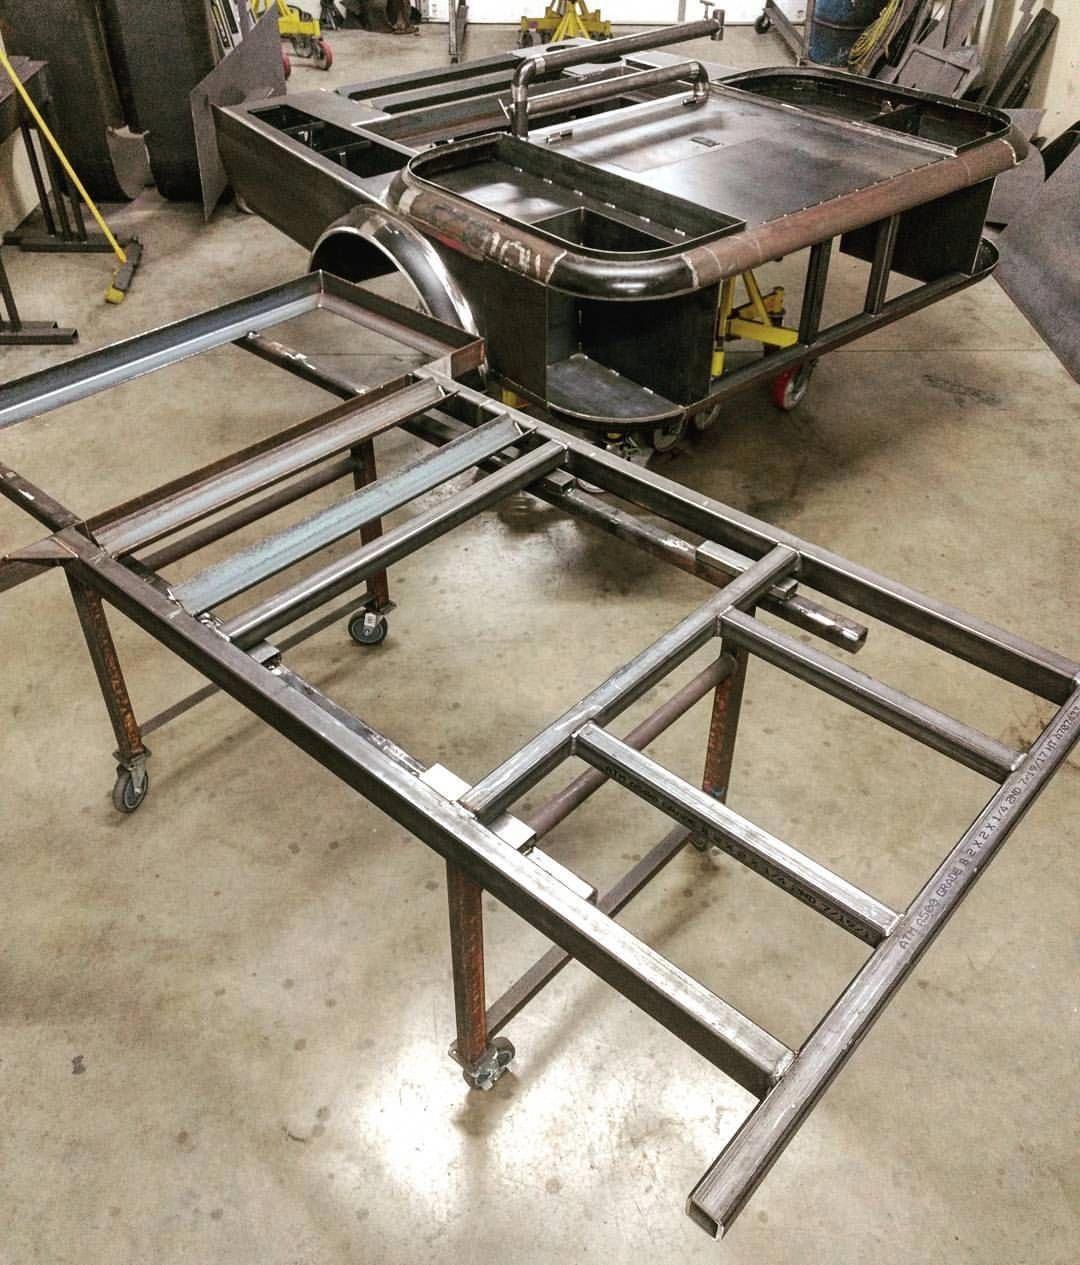 welding tools Welding in 2020 Welding rigs, Welding